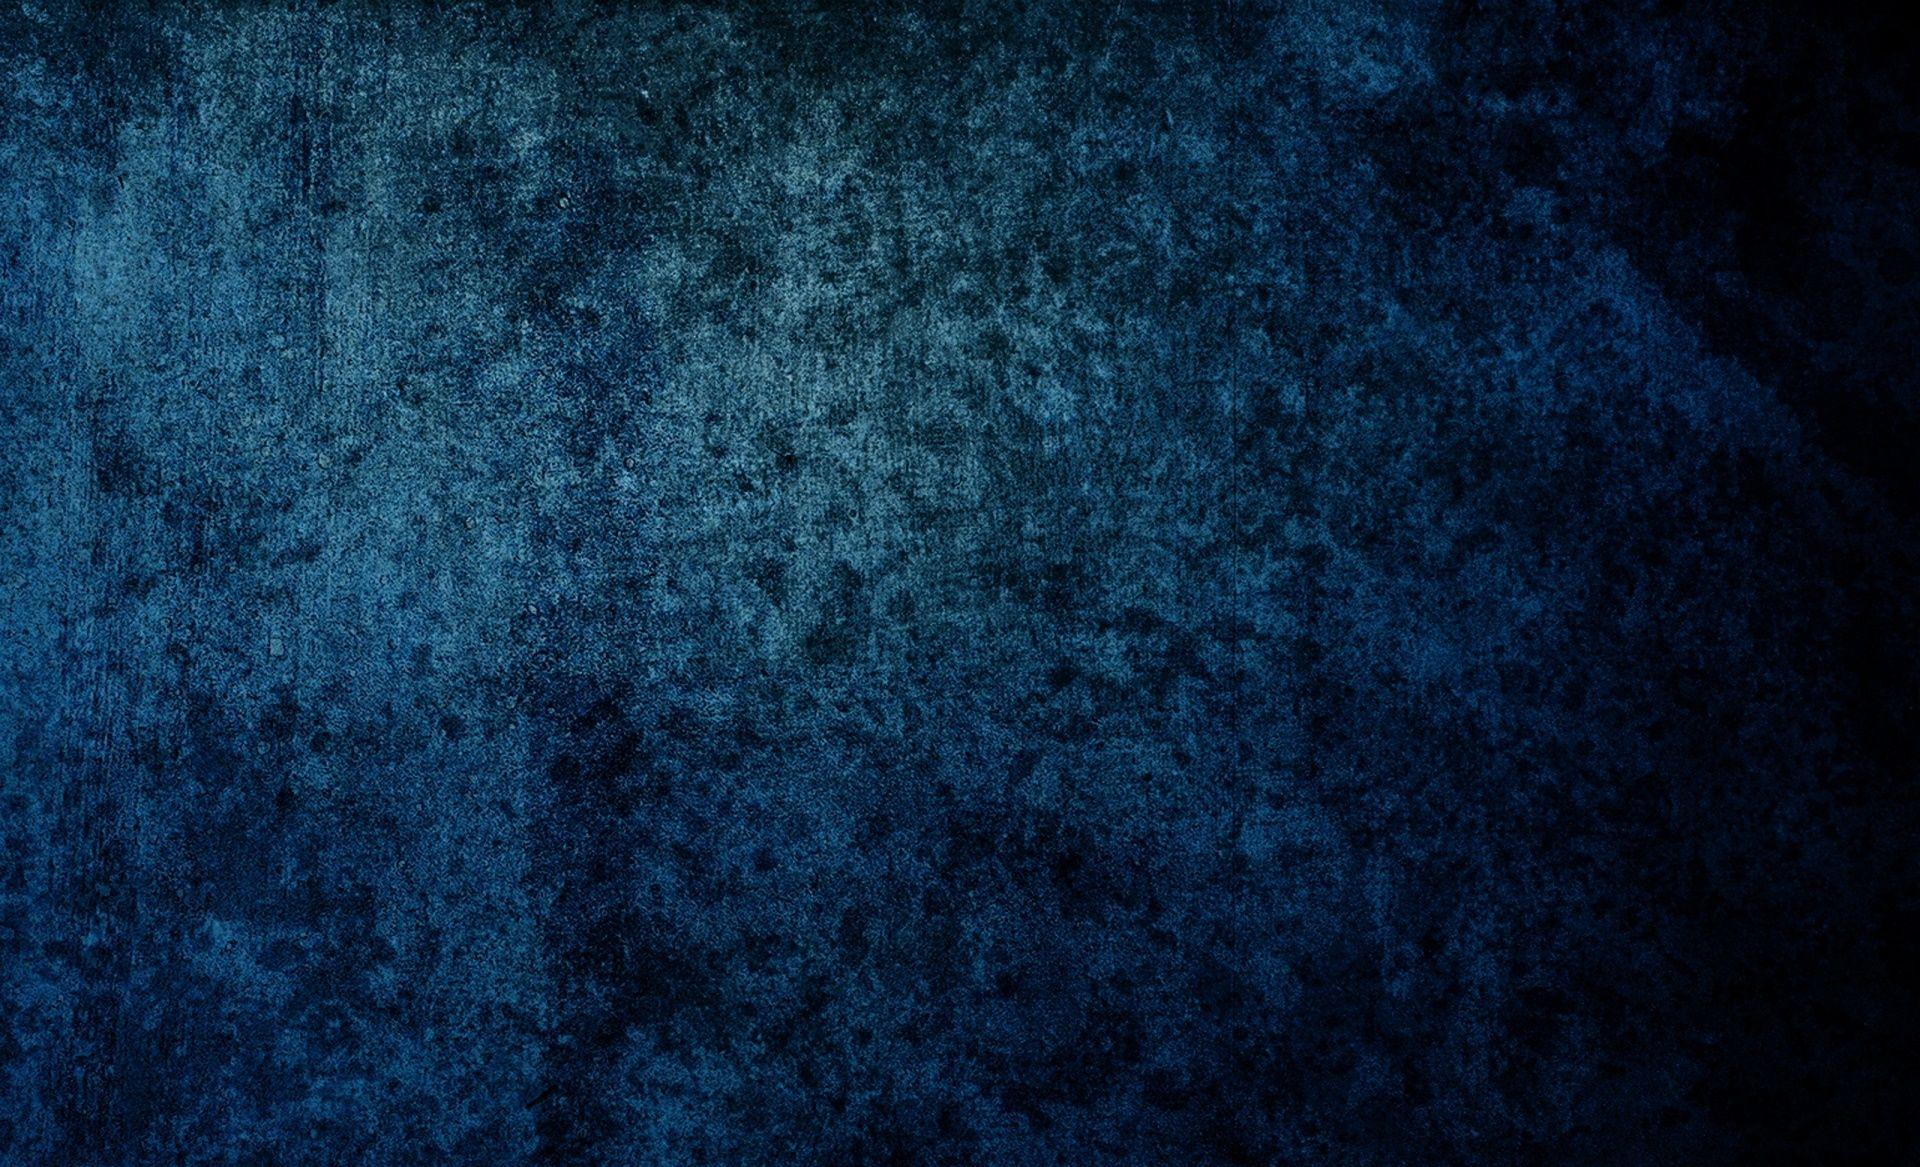 Grunge Desktop HD Wallpapers ...